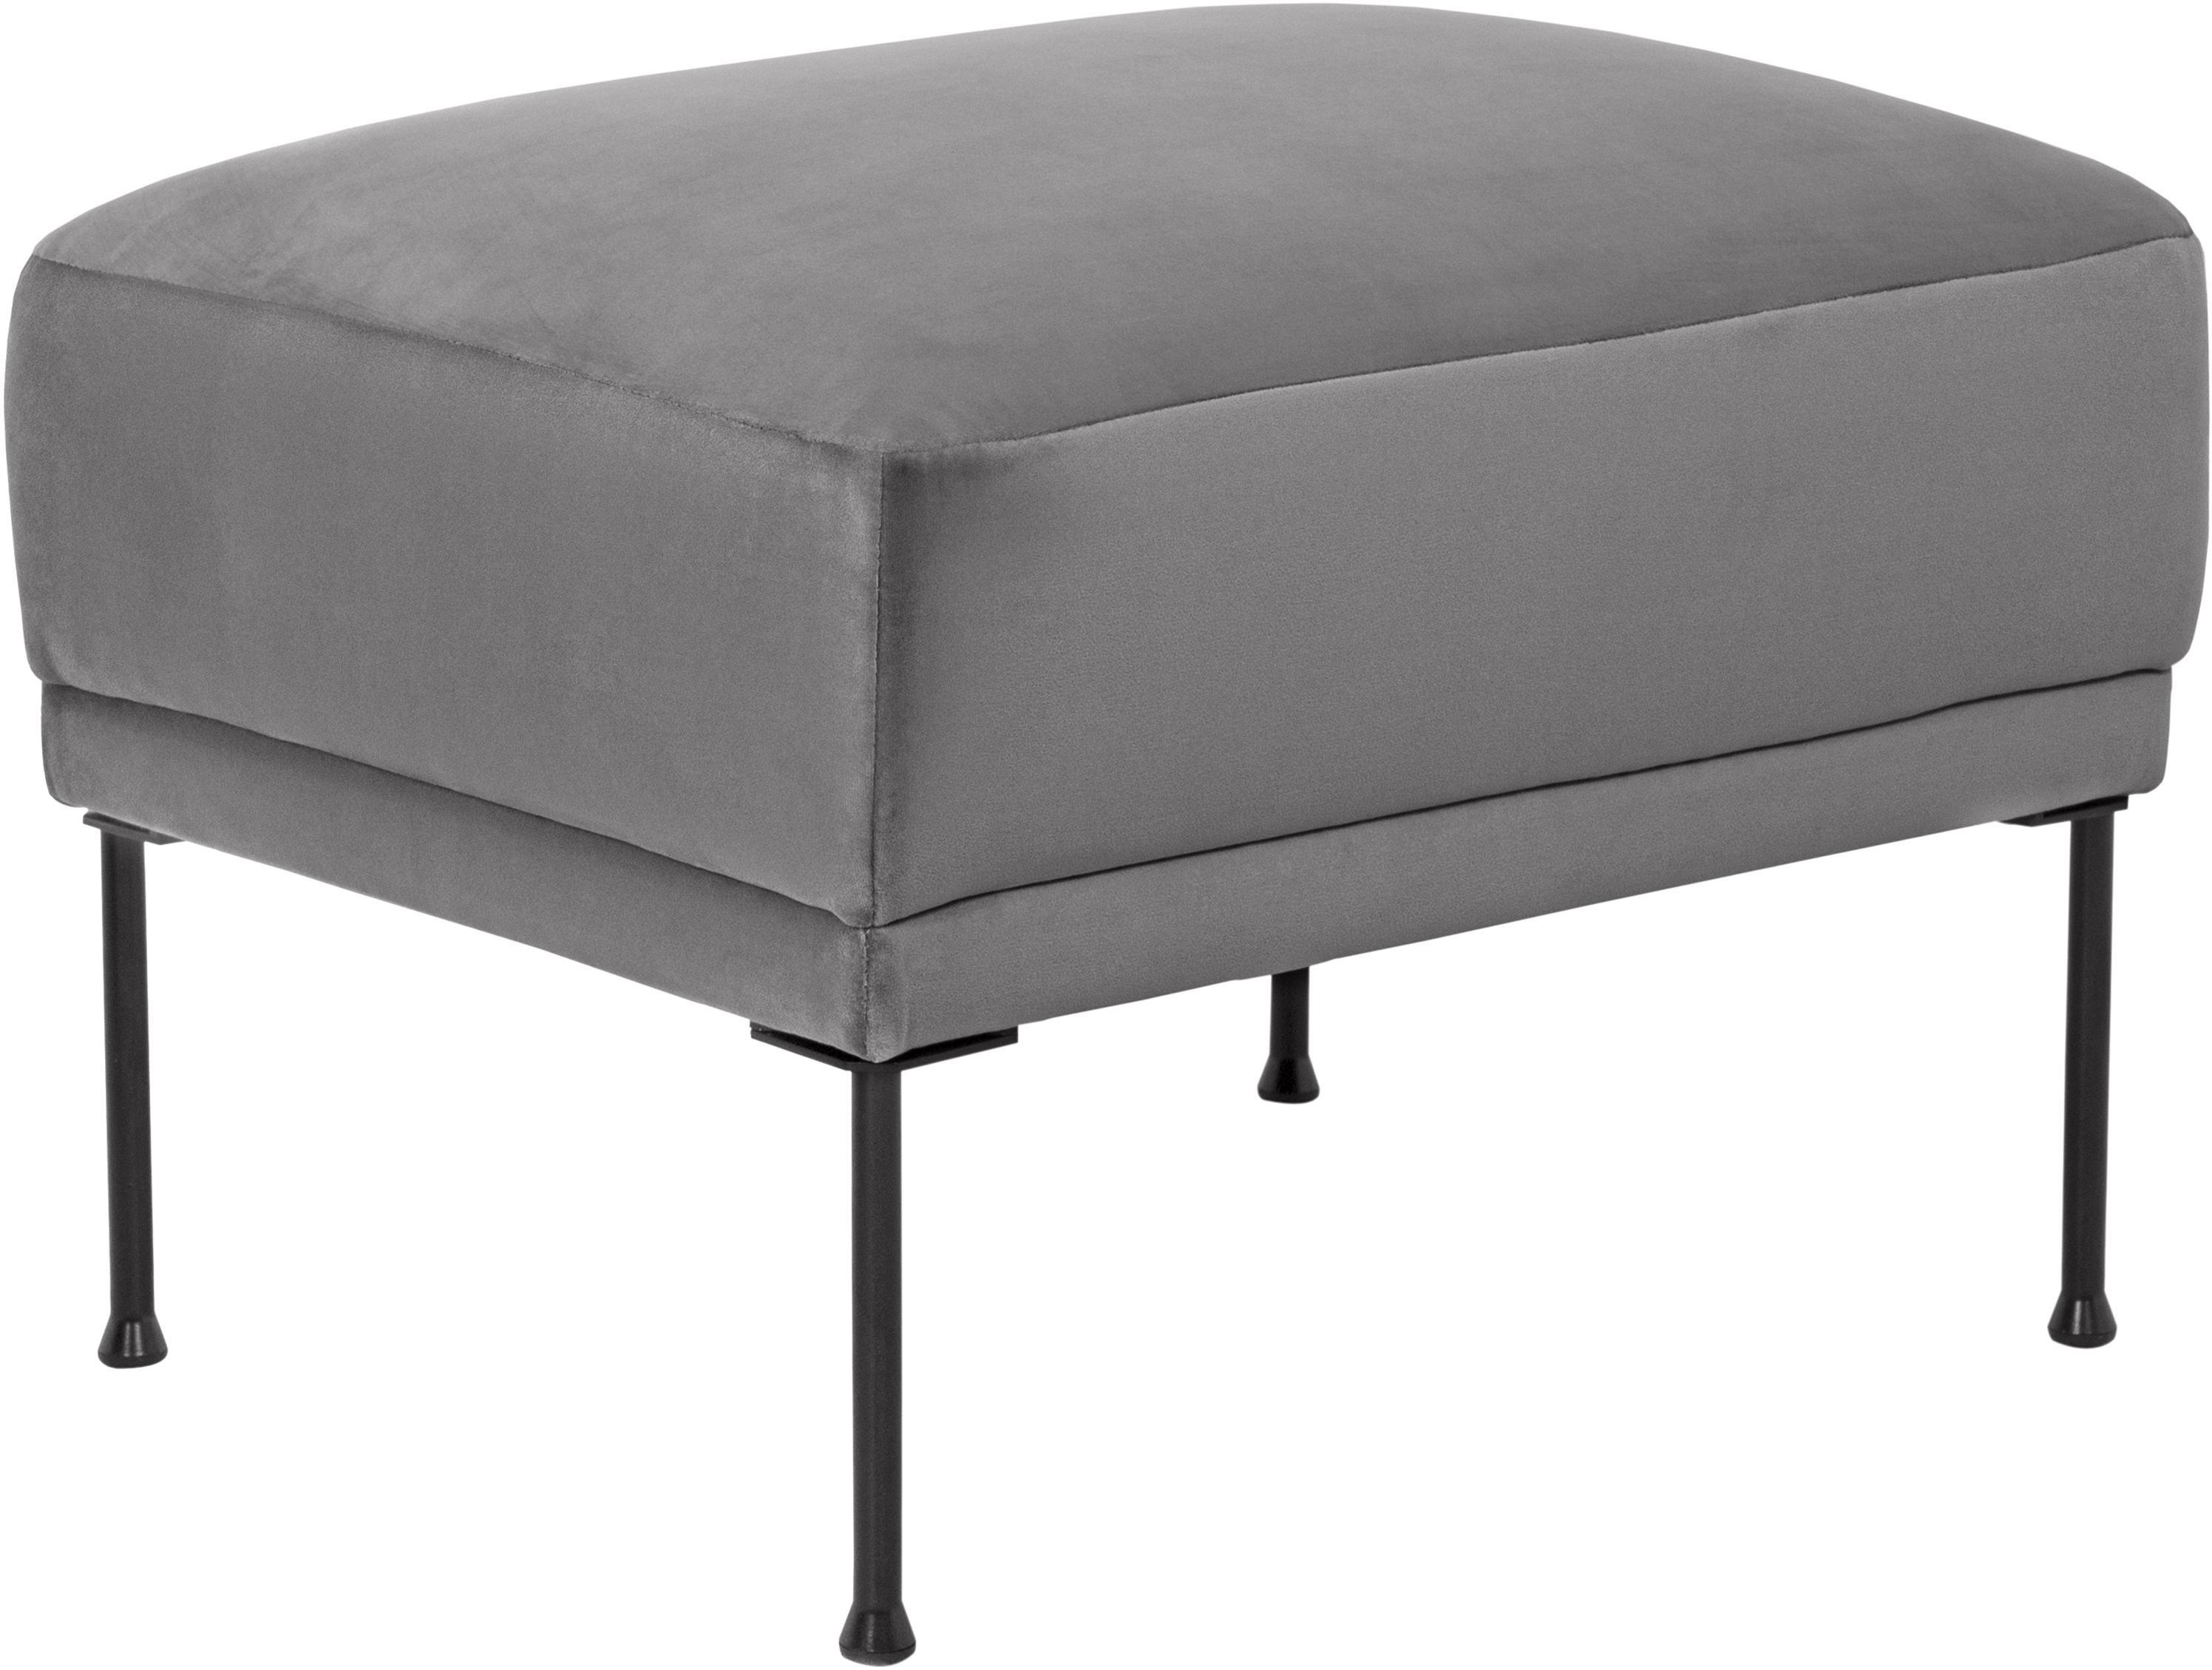 Sofa-Hocker Fluente aus Samt, Bezug: Samt (Hochwertiger Polyes, Gestell: Massives Kiefernholz, Samt Hellgrau, 62 x 46 cm